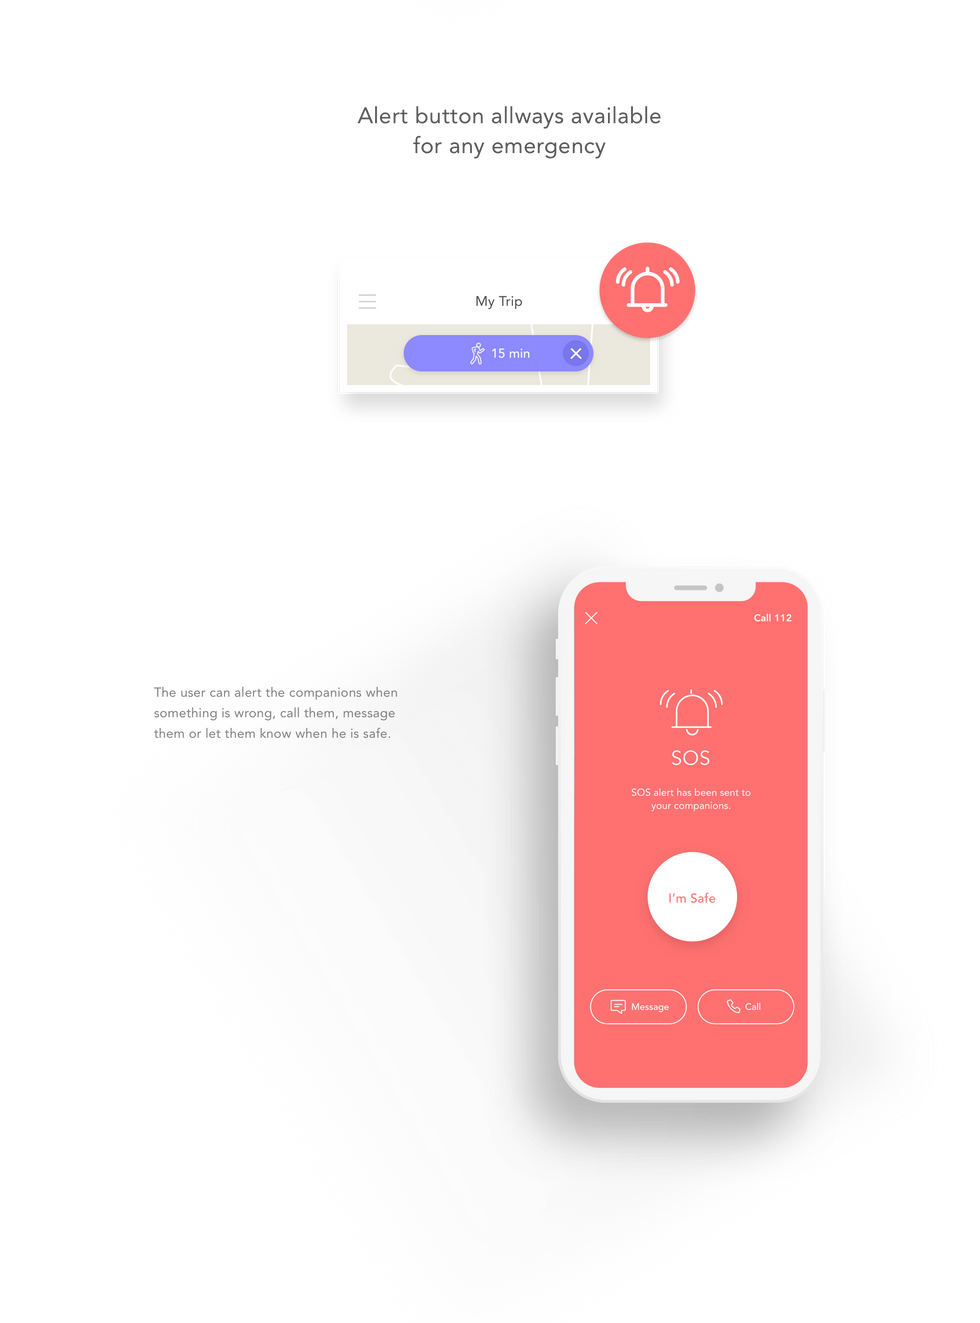 UX_UI_Design_buddy_app-7.png